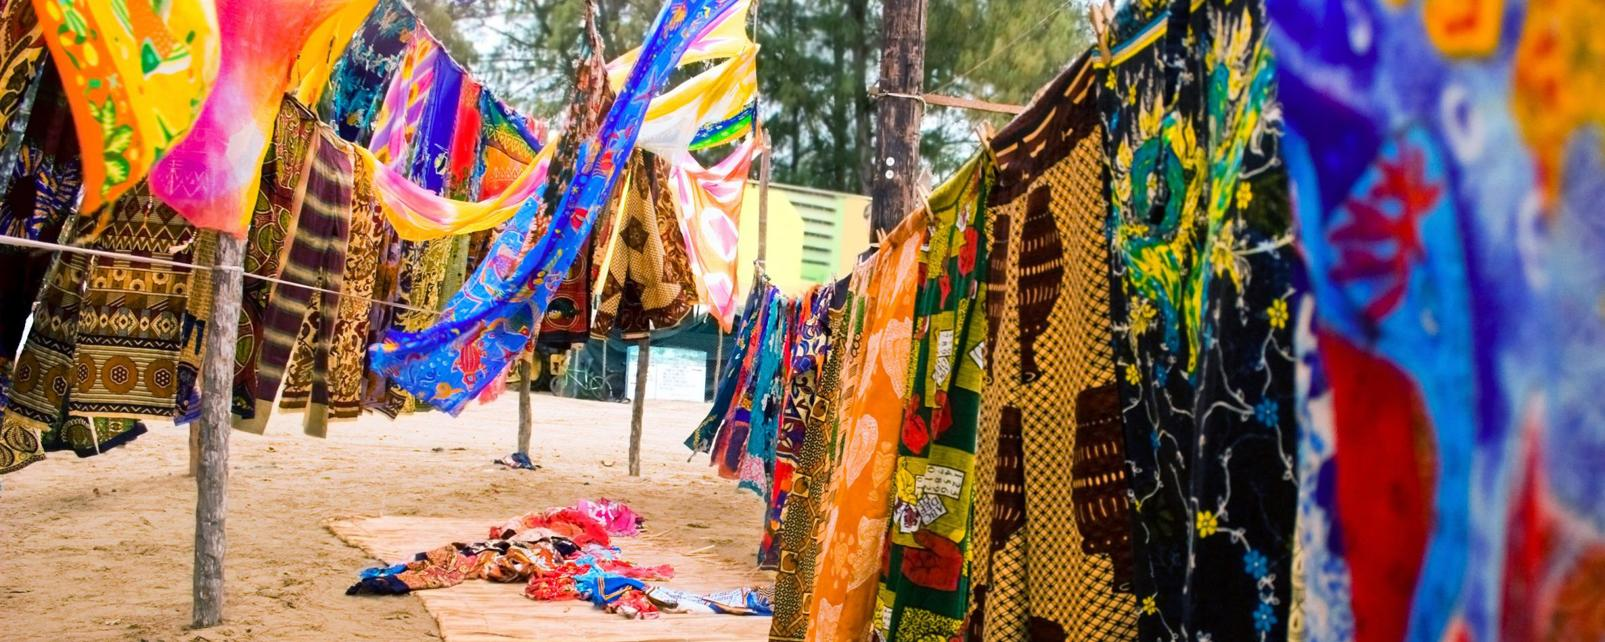 Afrique; Burundi; Bujumbura; marché; arbre; sarong; coloré;